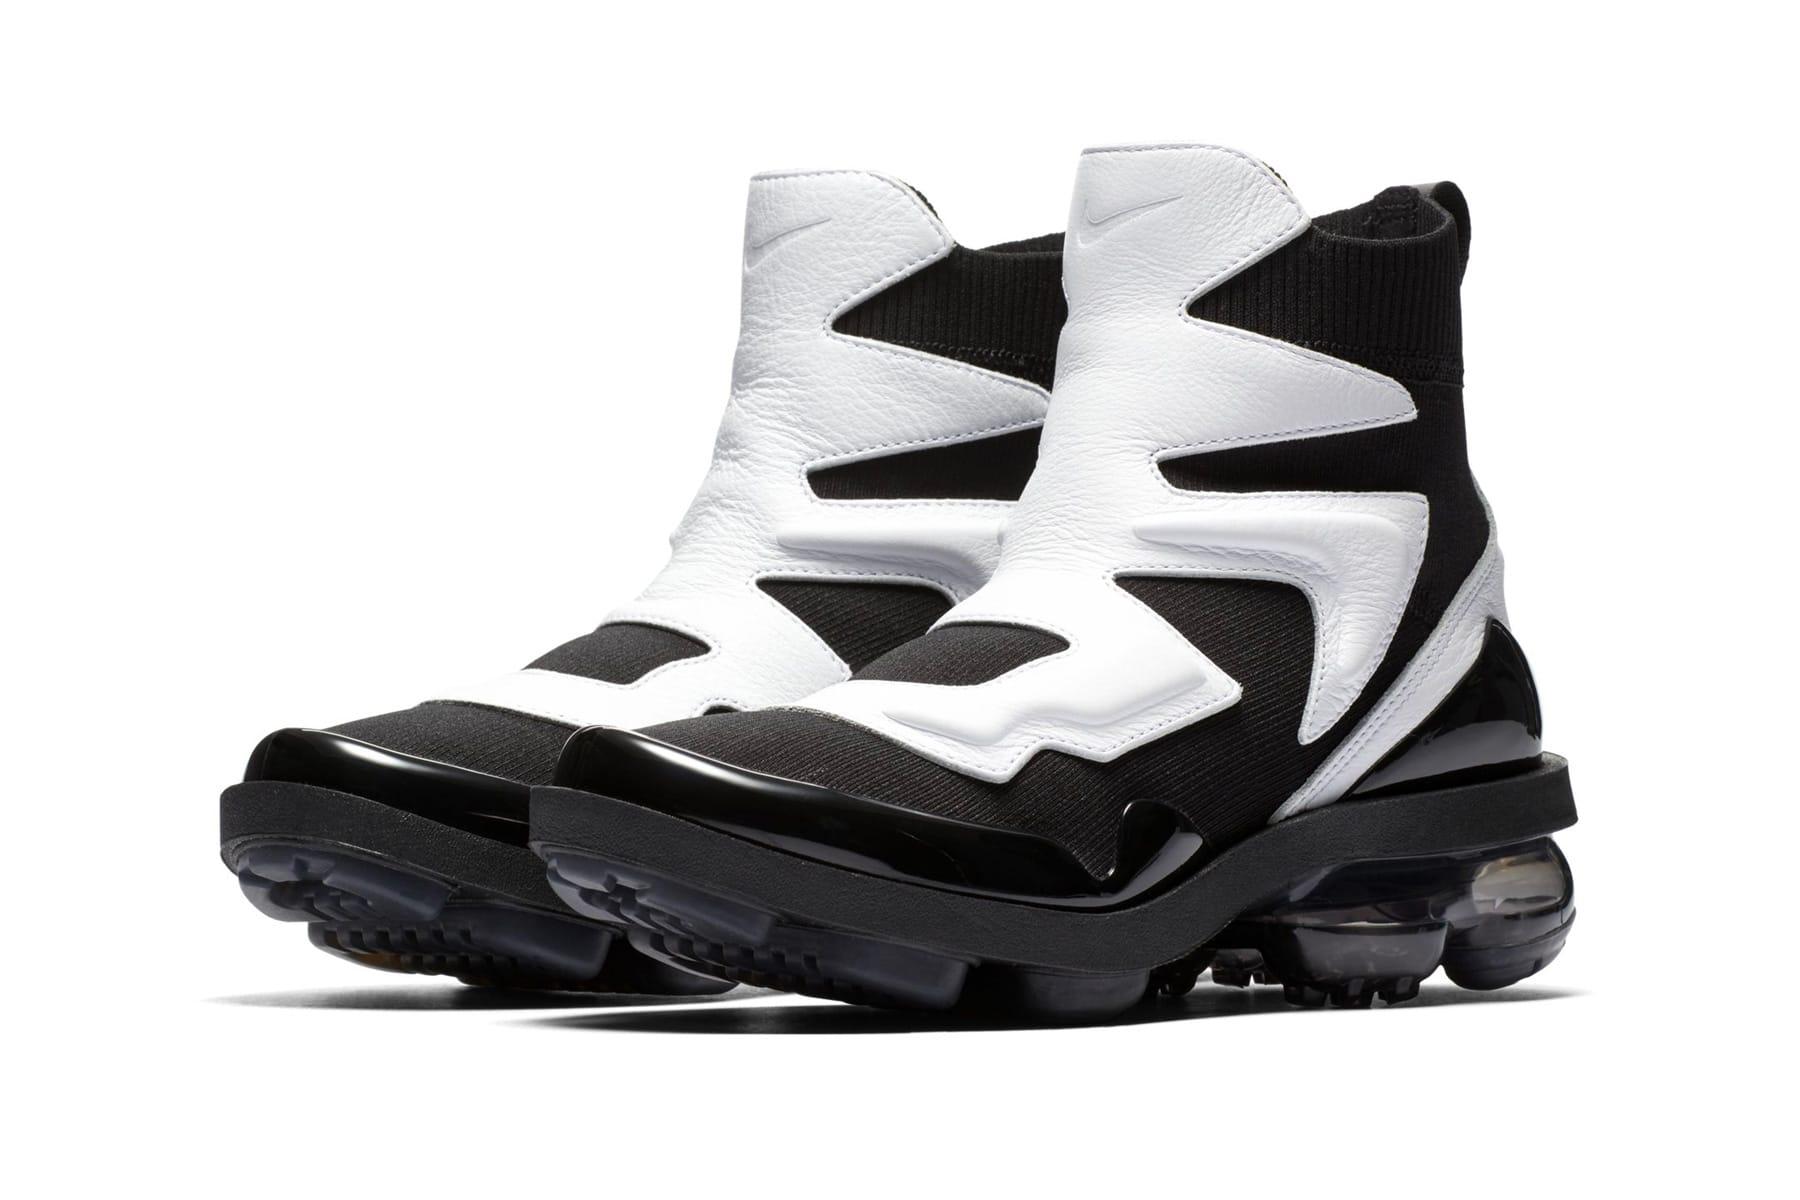 Nike Air VaporMax Light 2 Black/White